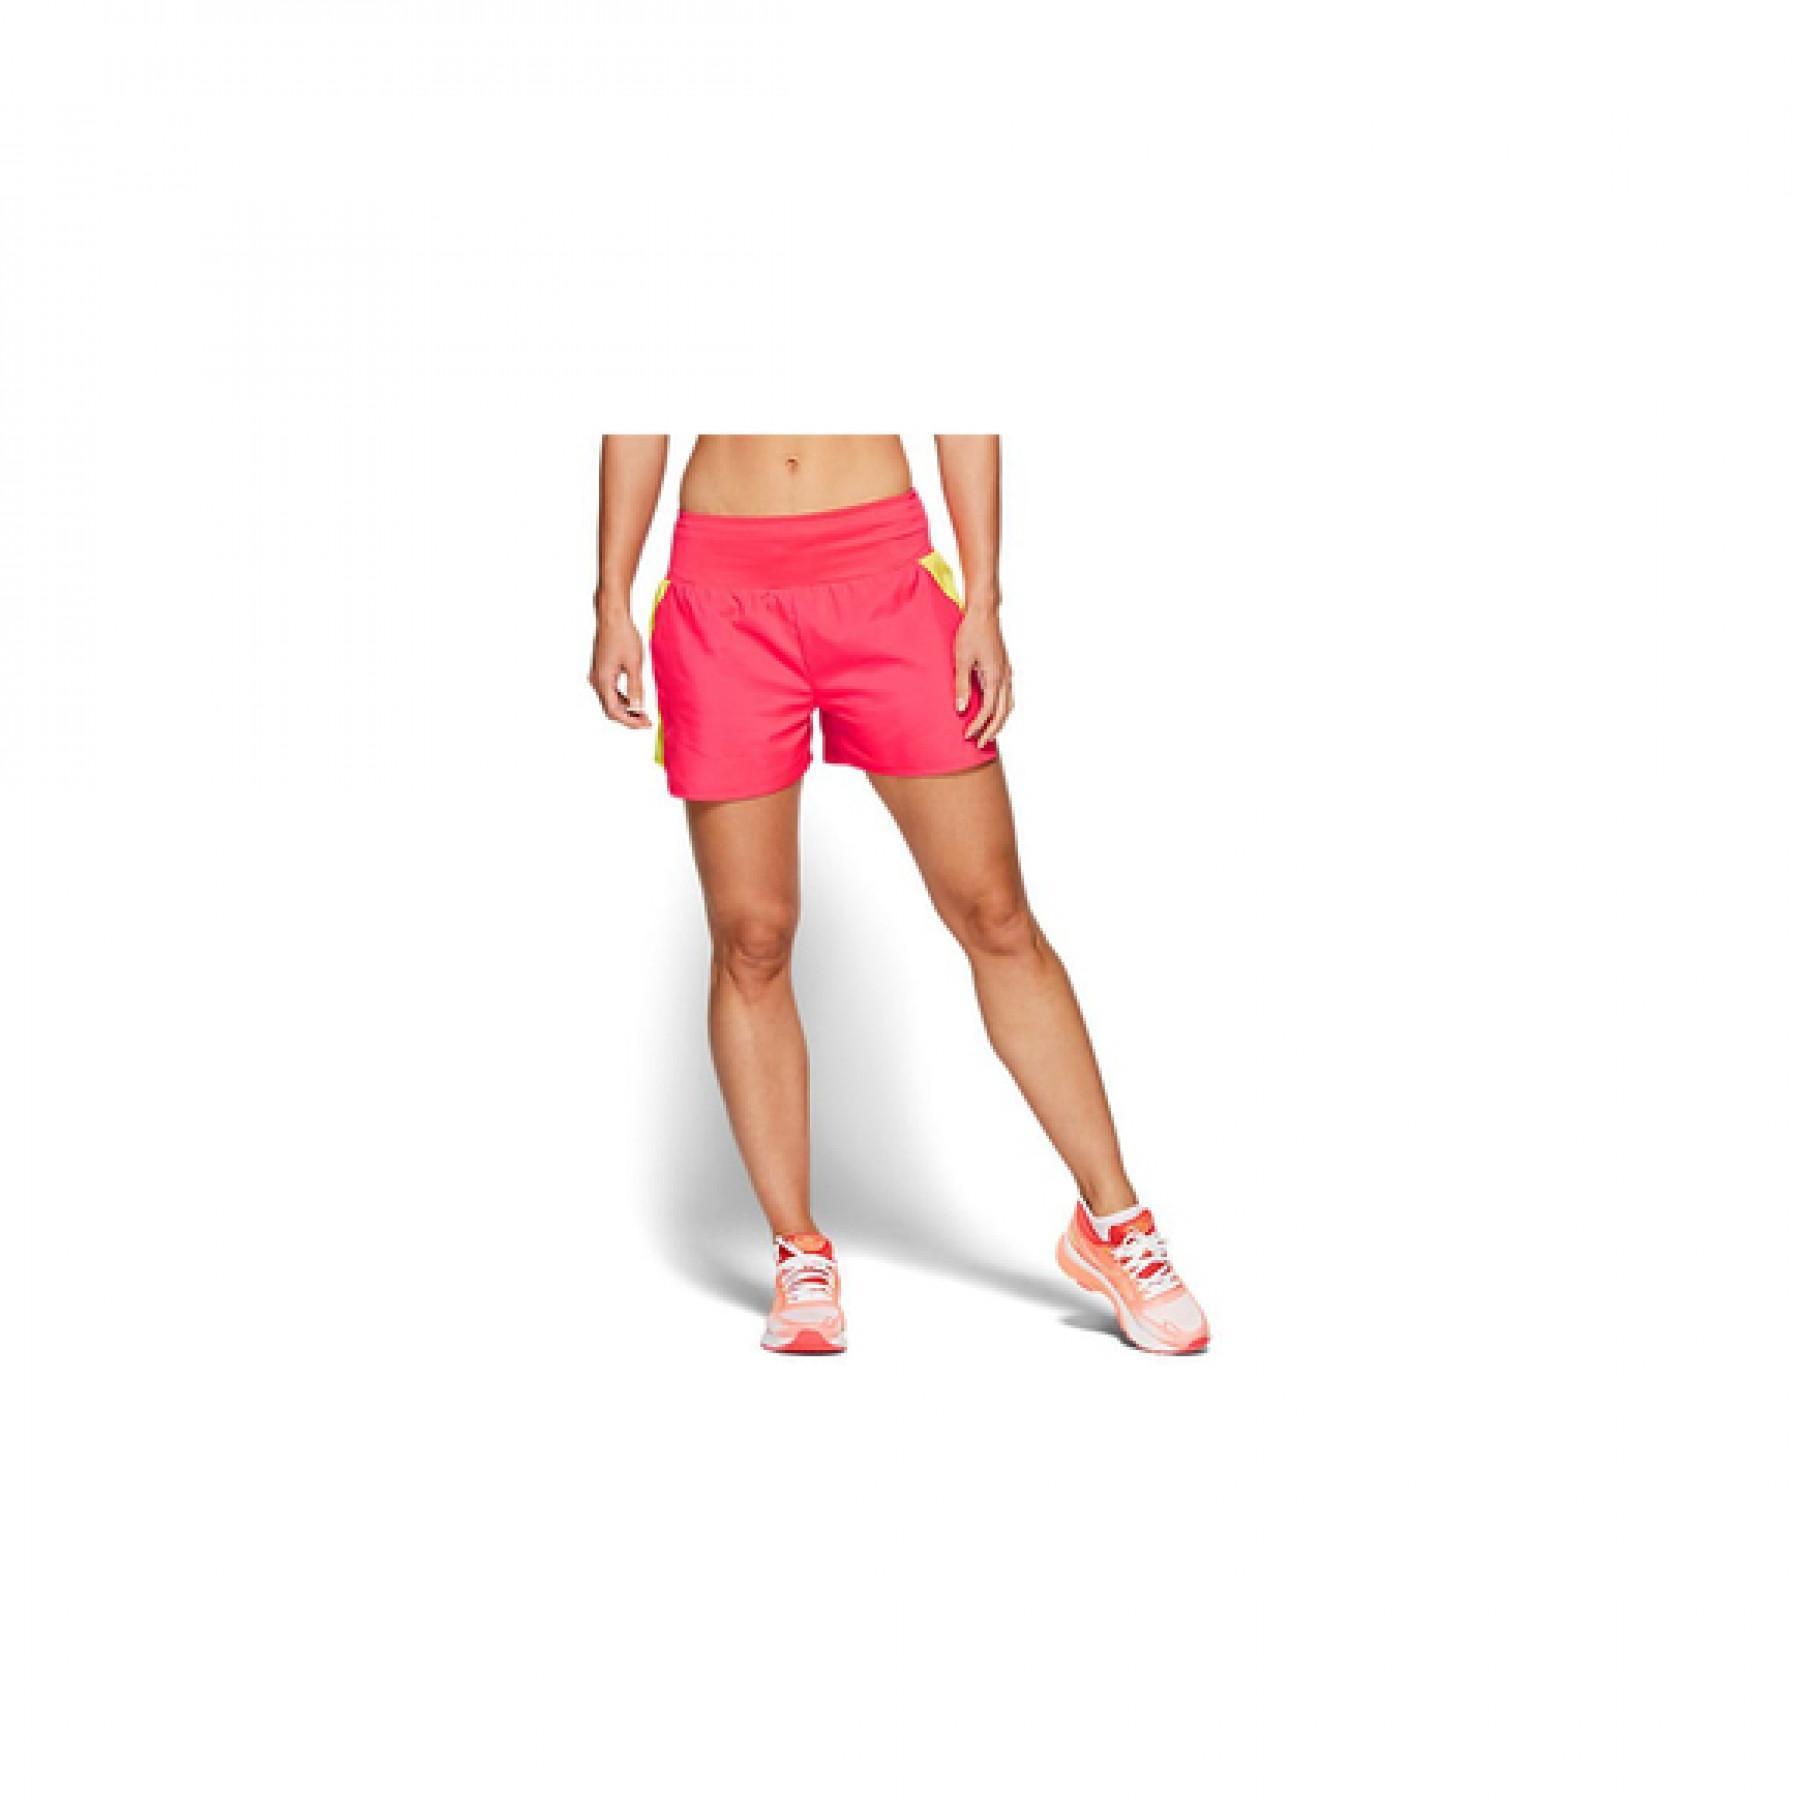 Asics 3.5in Women's Shorts